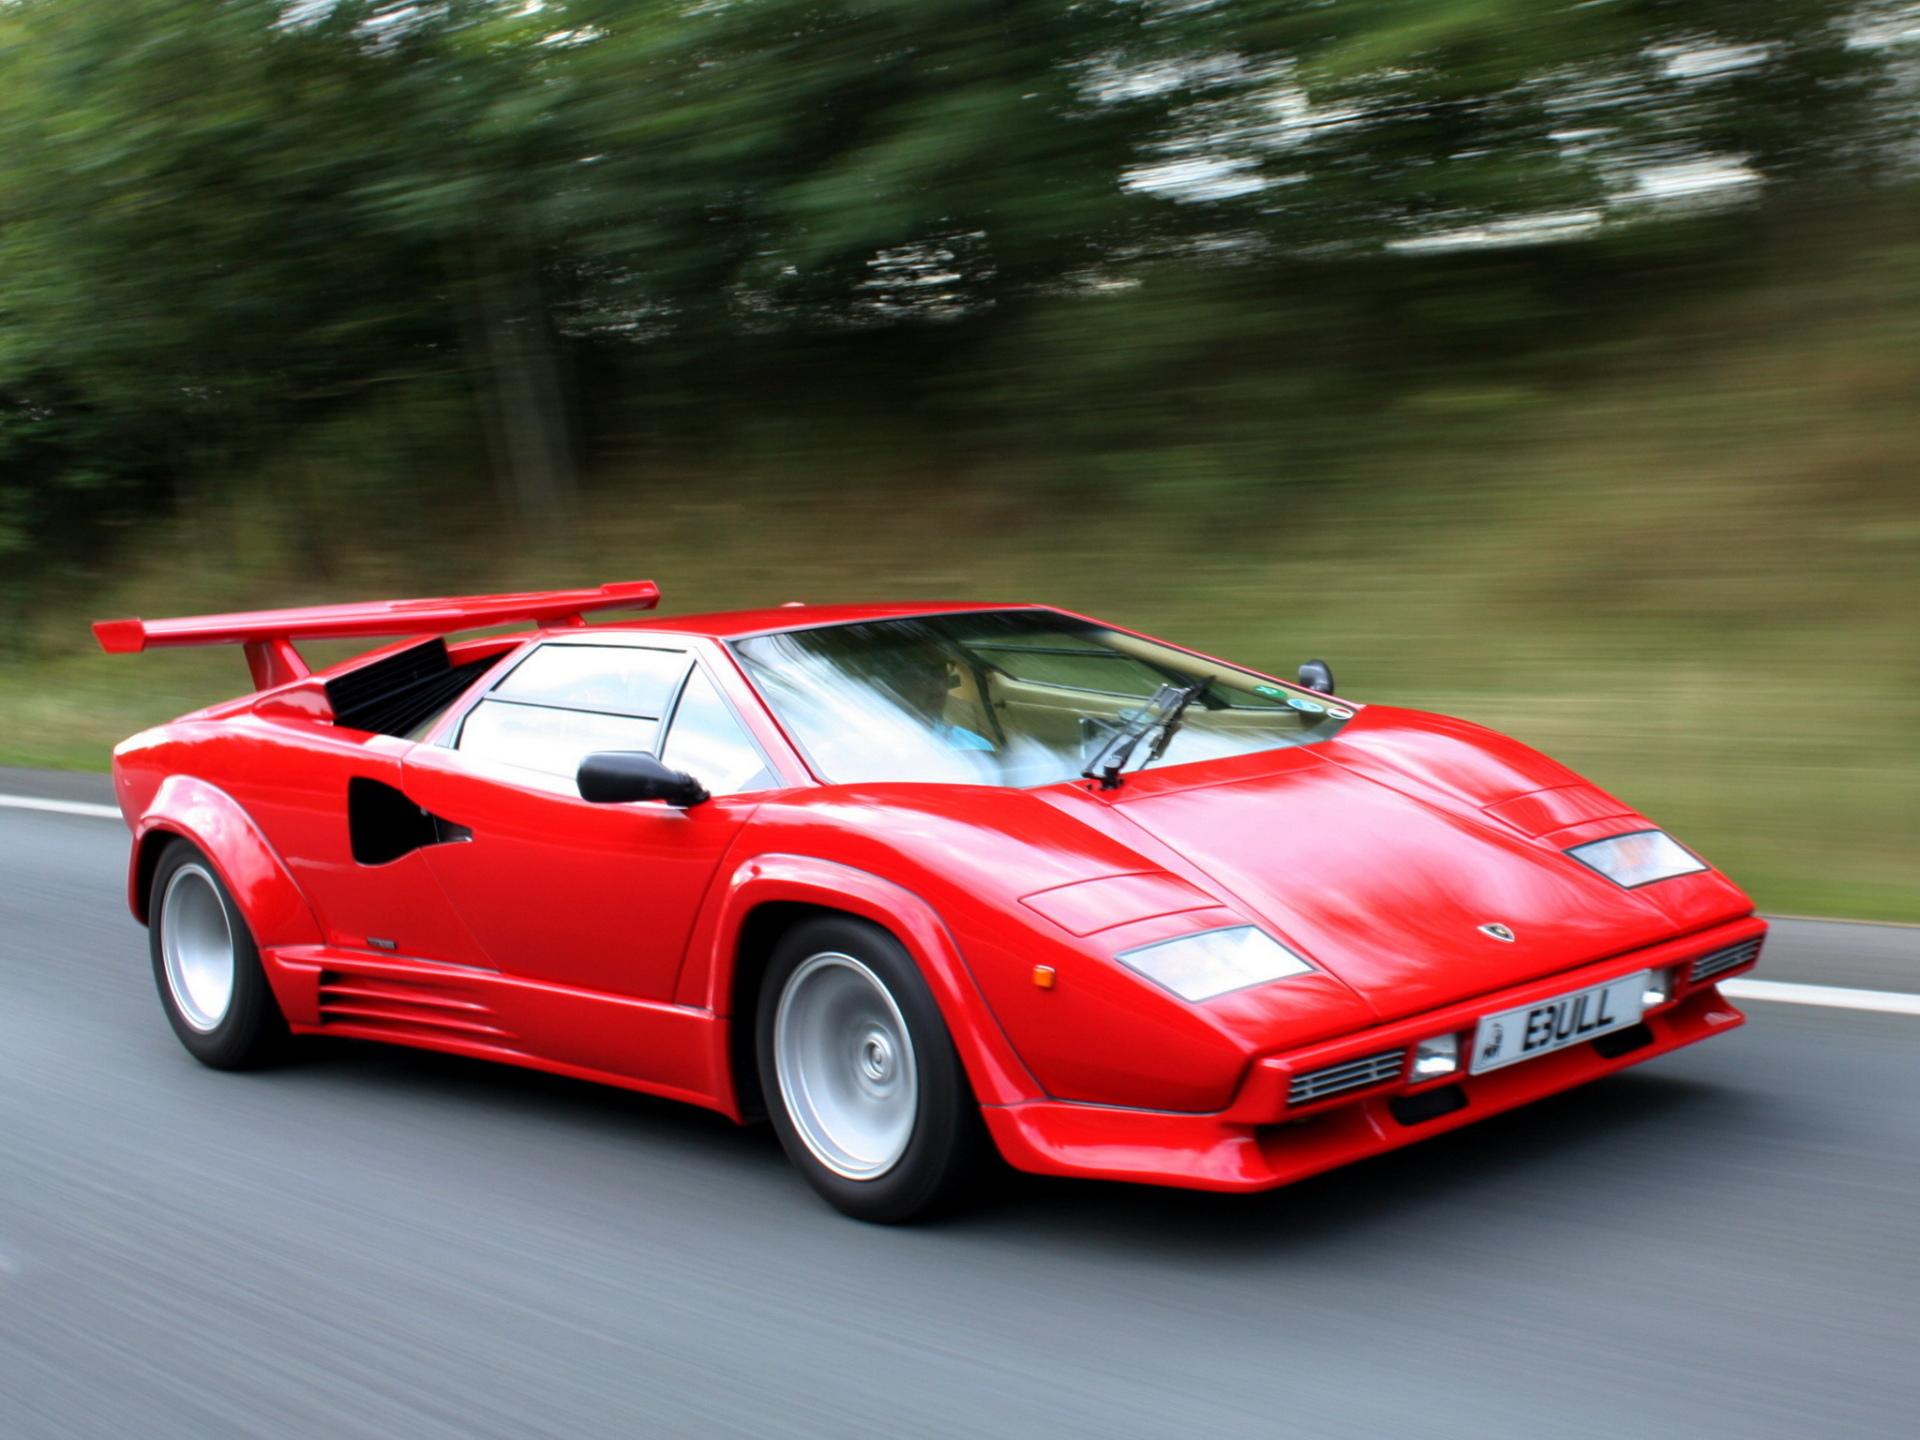 Fondos De Pantalla De Lamborghini Wallpapers Hd Gratis